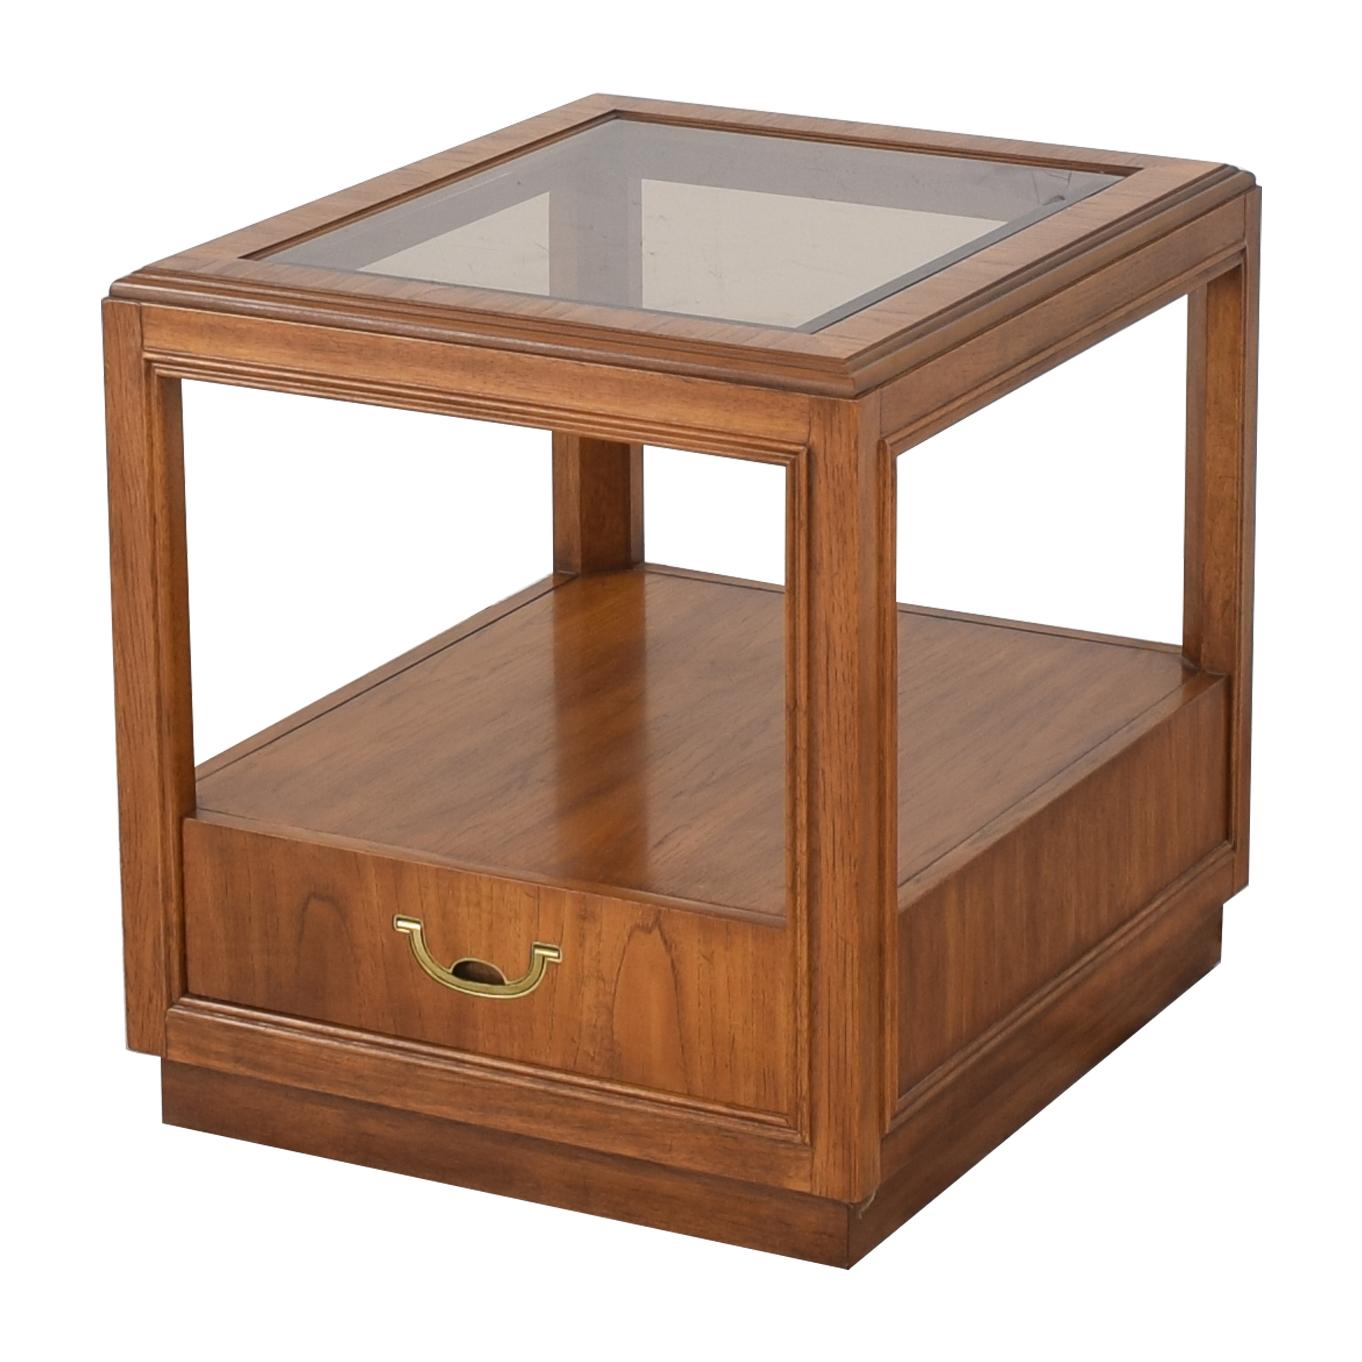 Drexel Heritage Drexel Heritage Glass Top Side Table discount